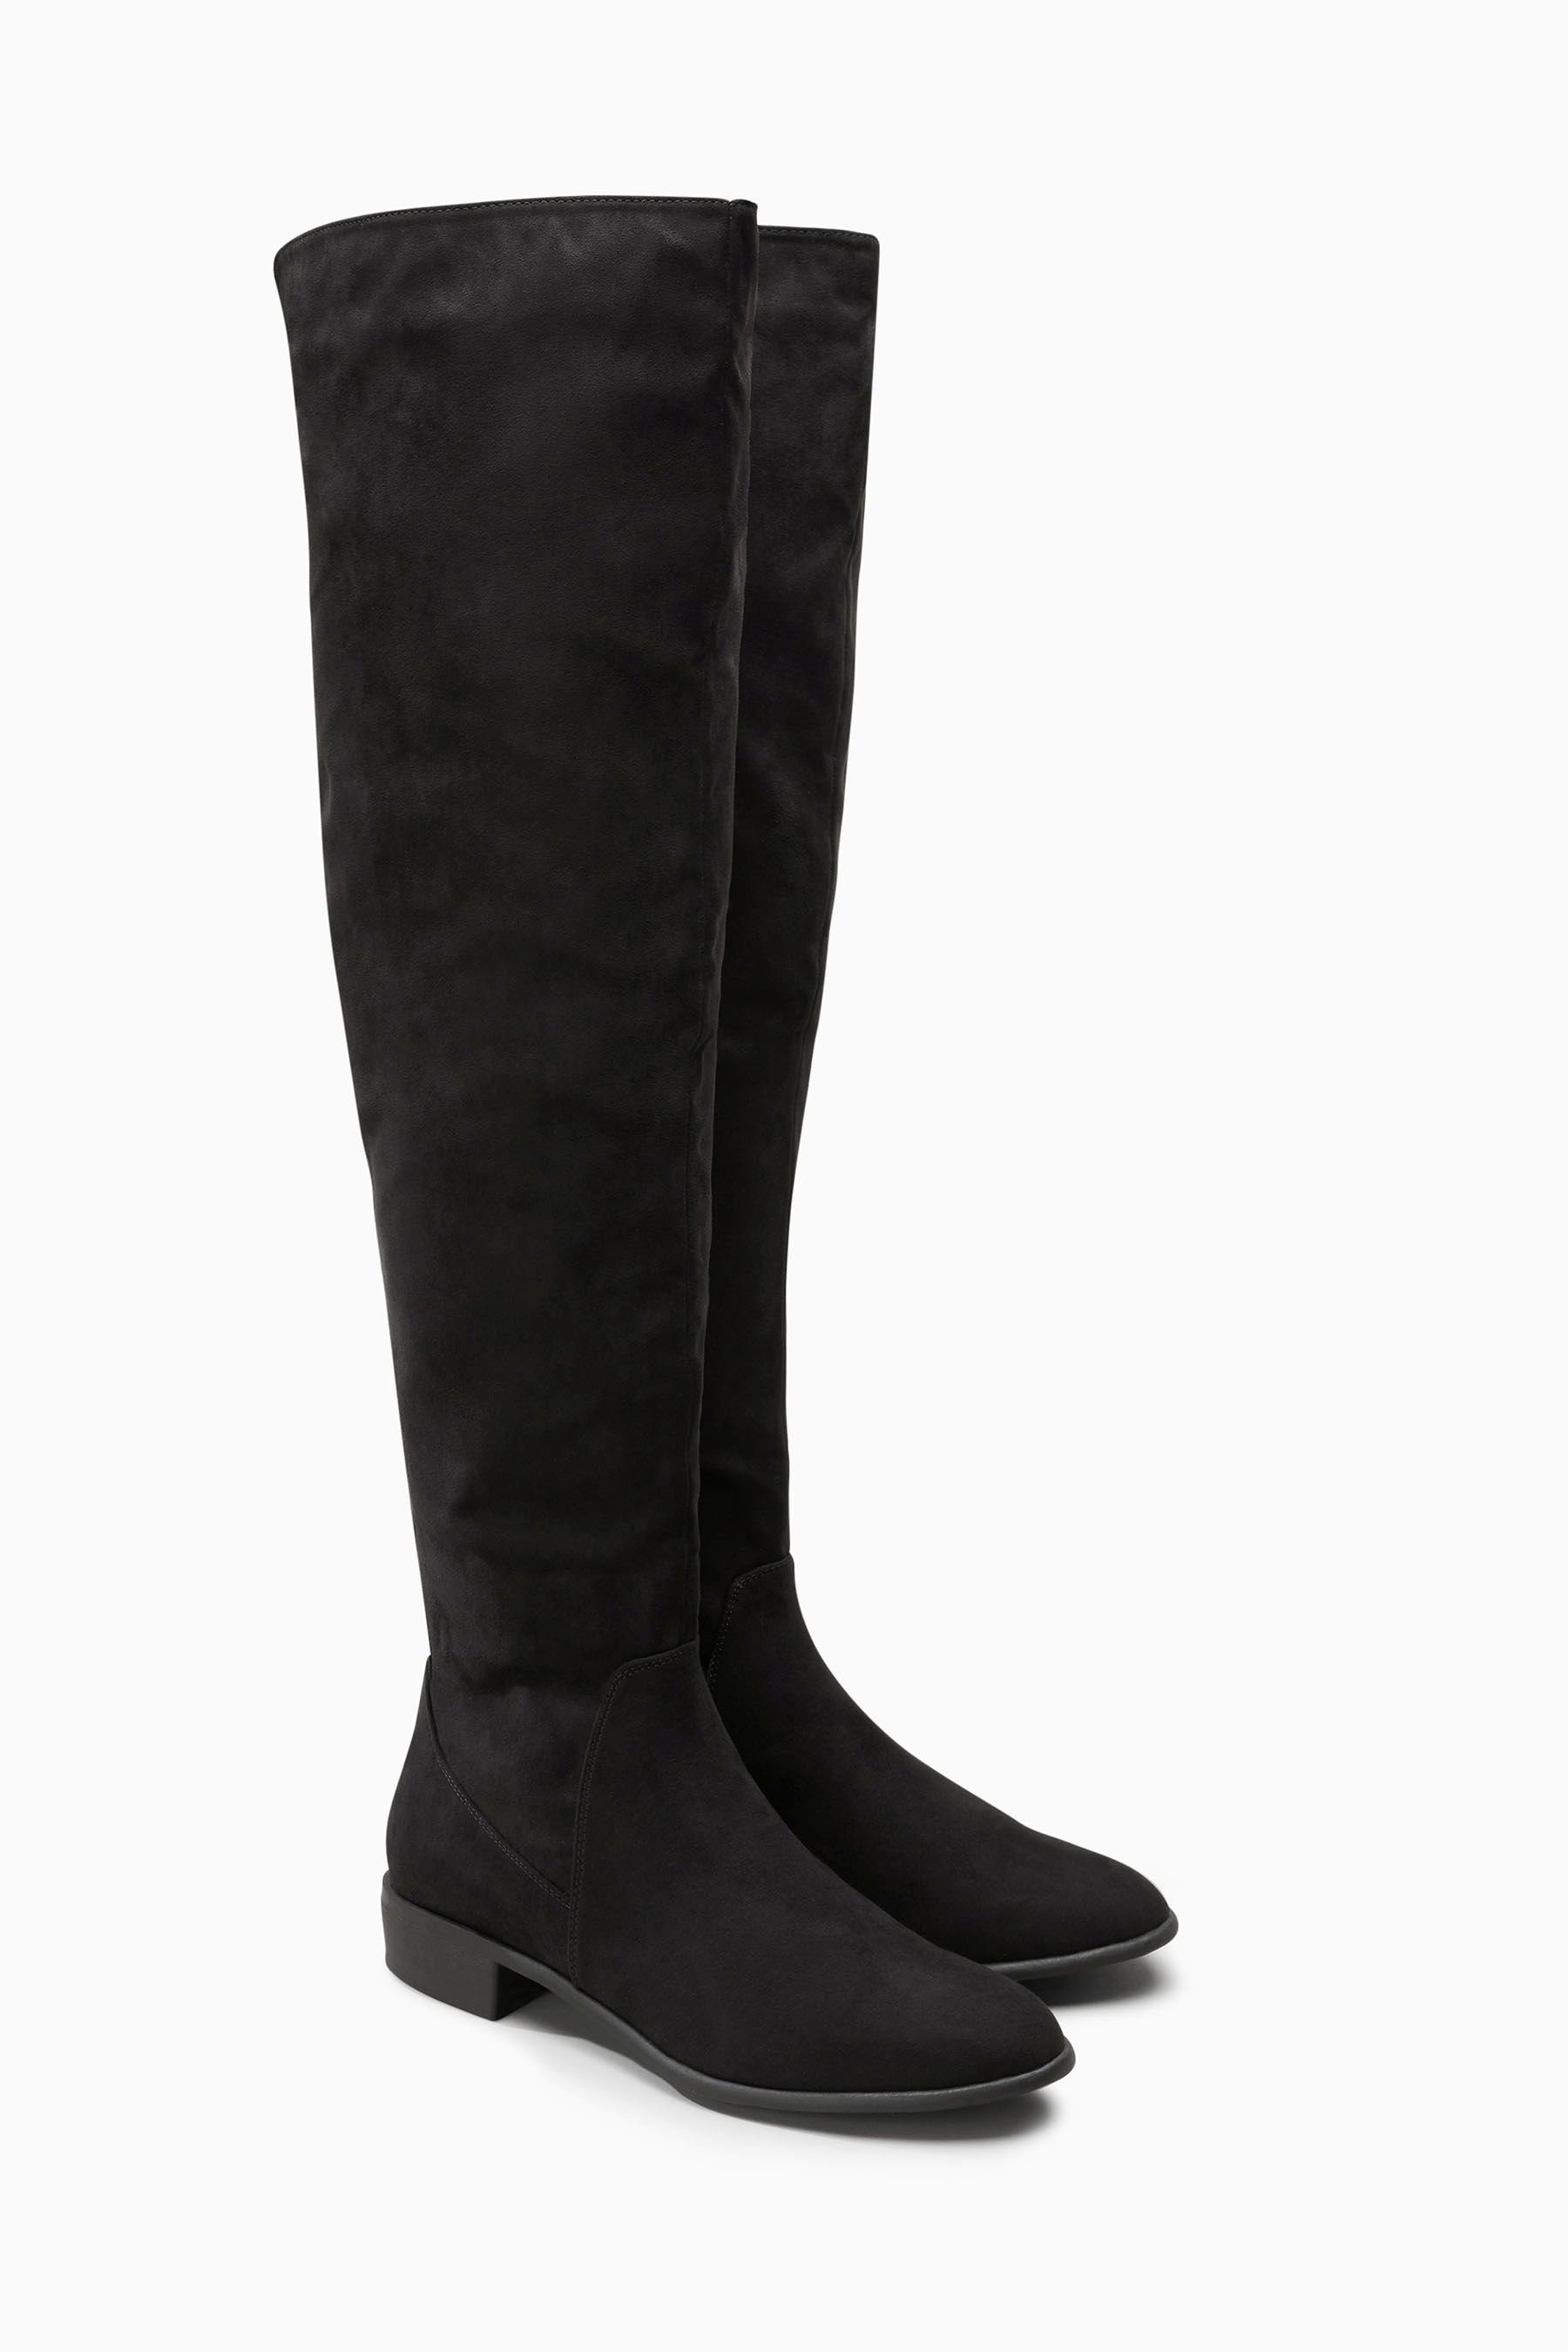 Flache Overknee-Stiefel, schwarz, Black Next